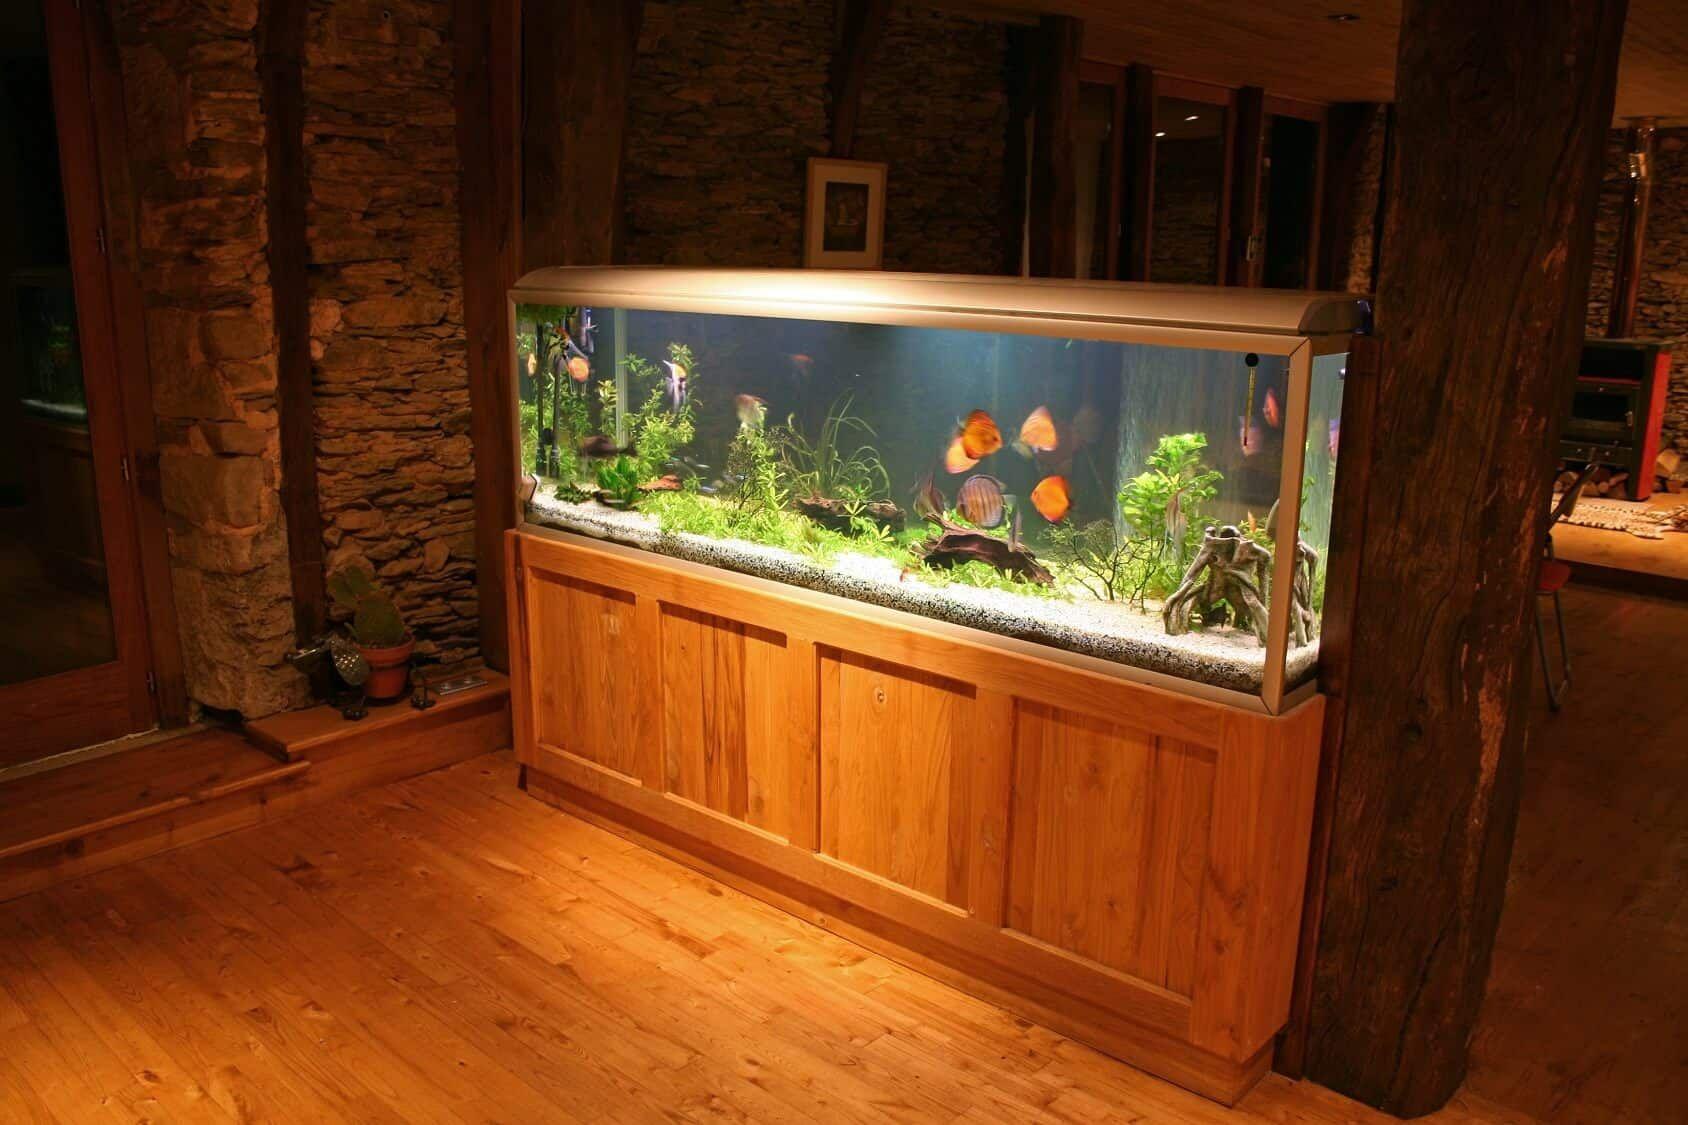 55 gallon fish tank guide best fish setup ideas